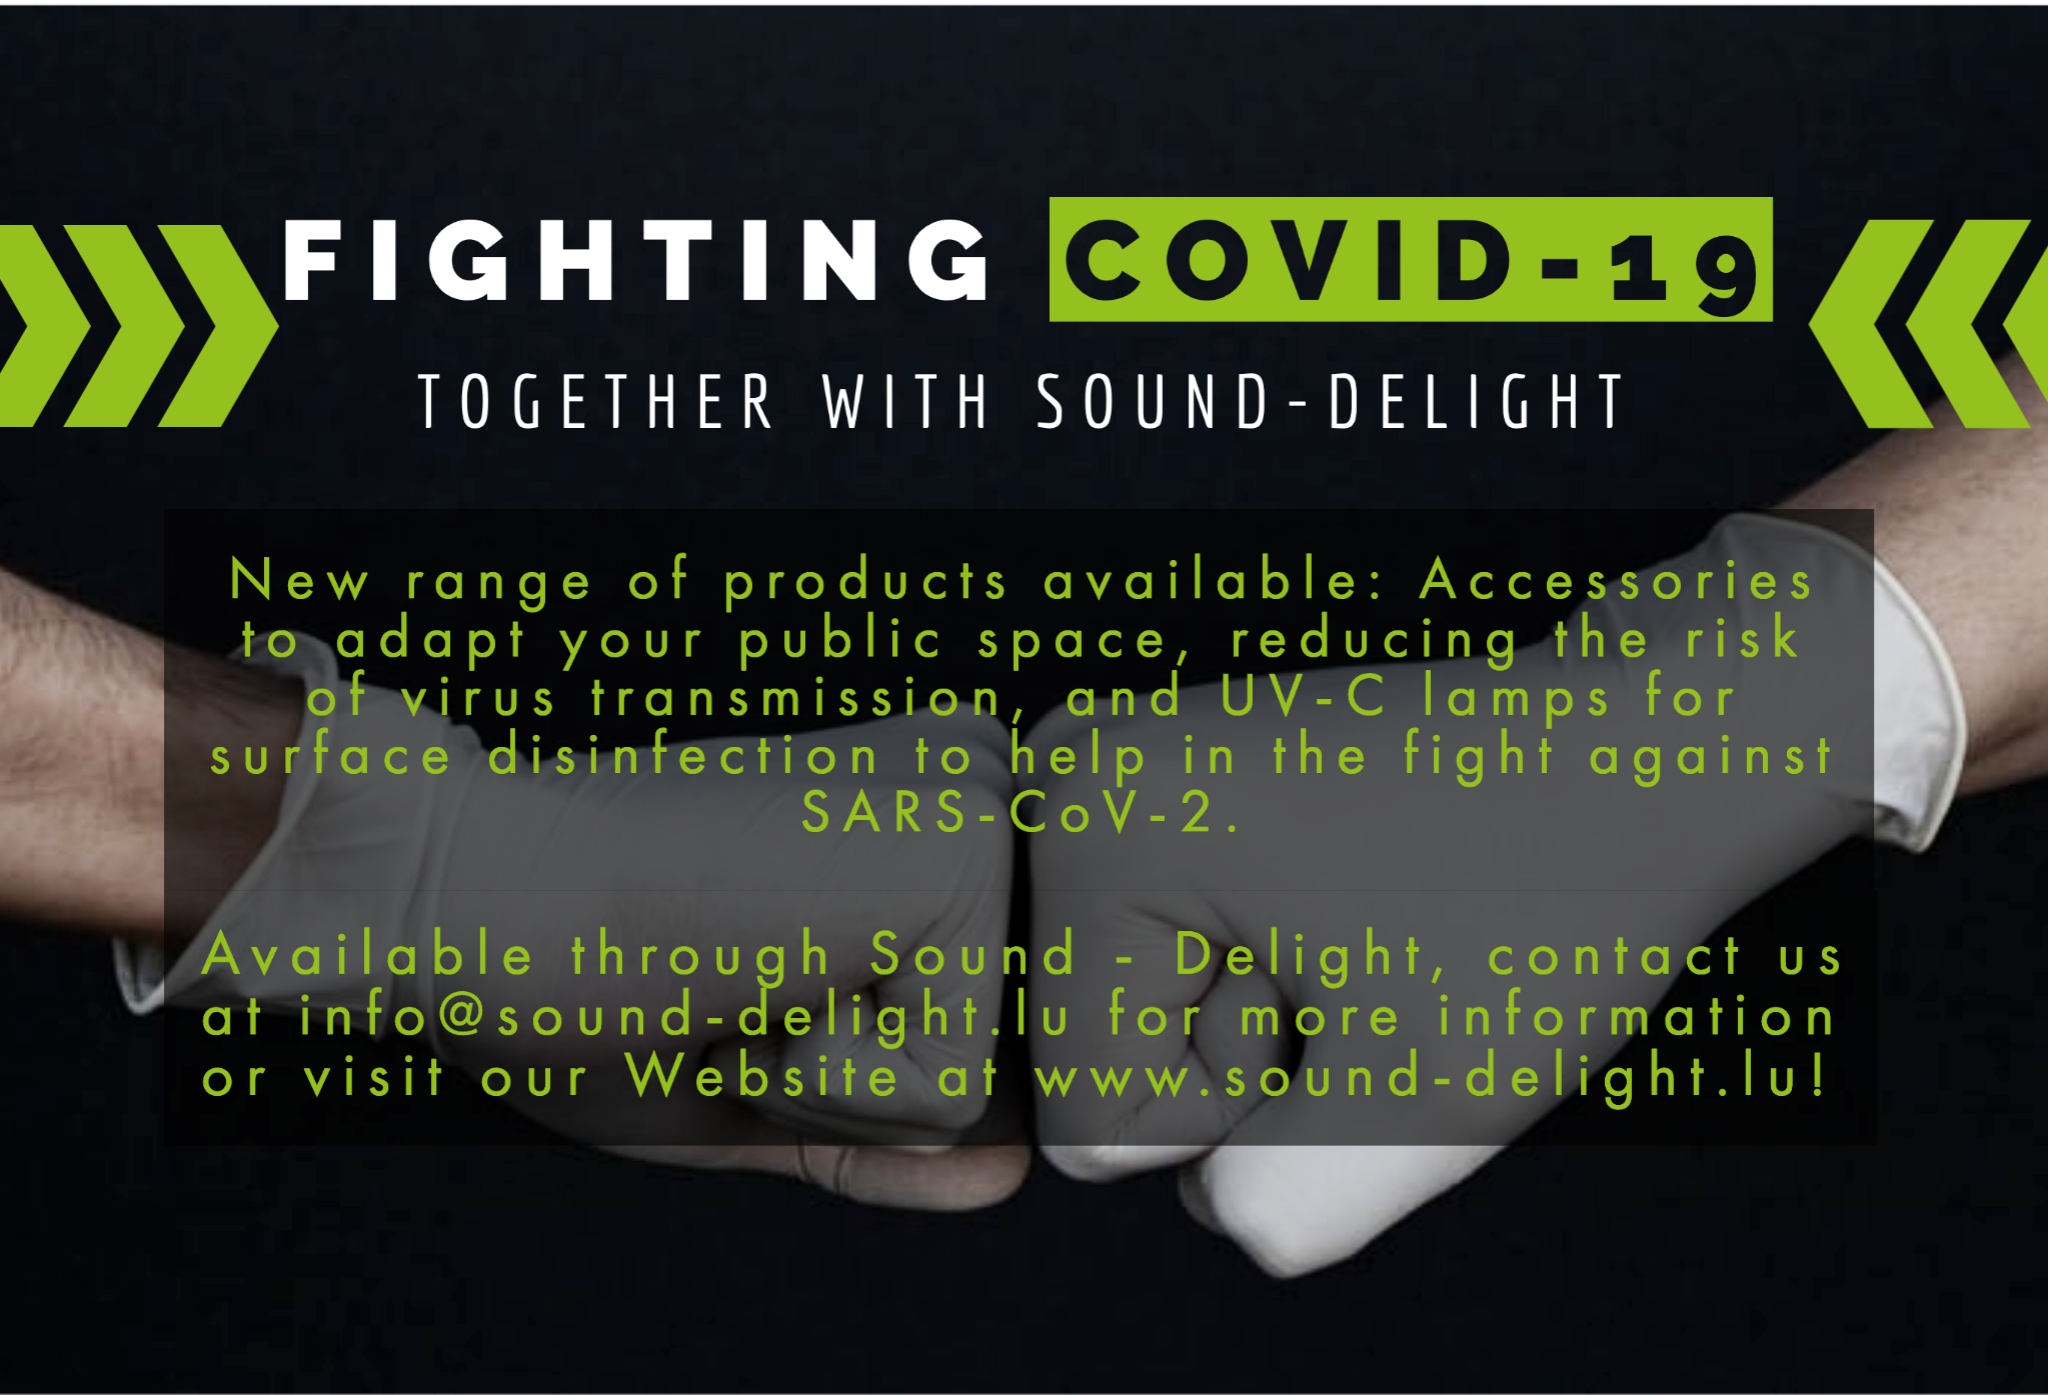 Fighting Covid-19